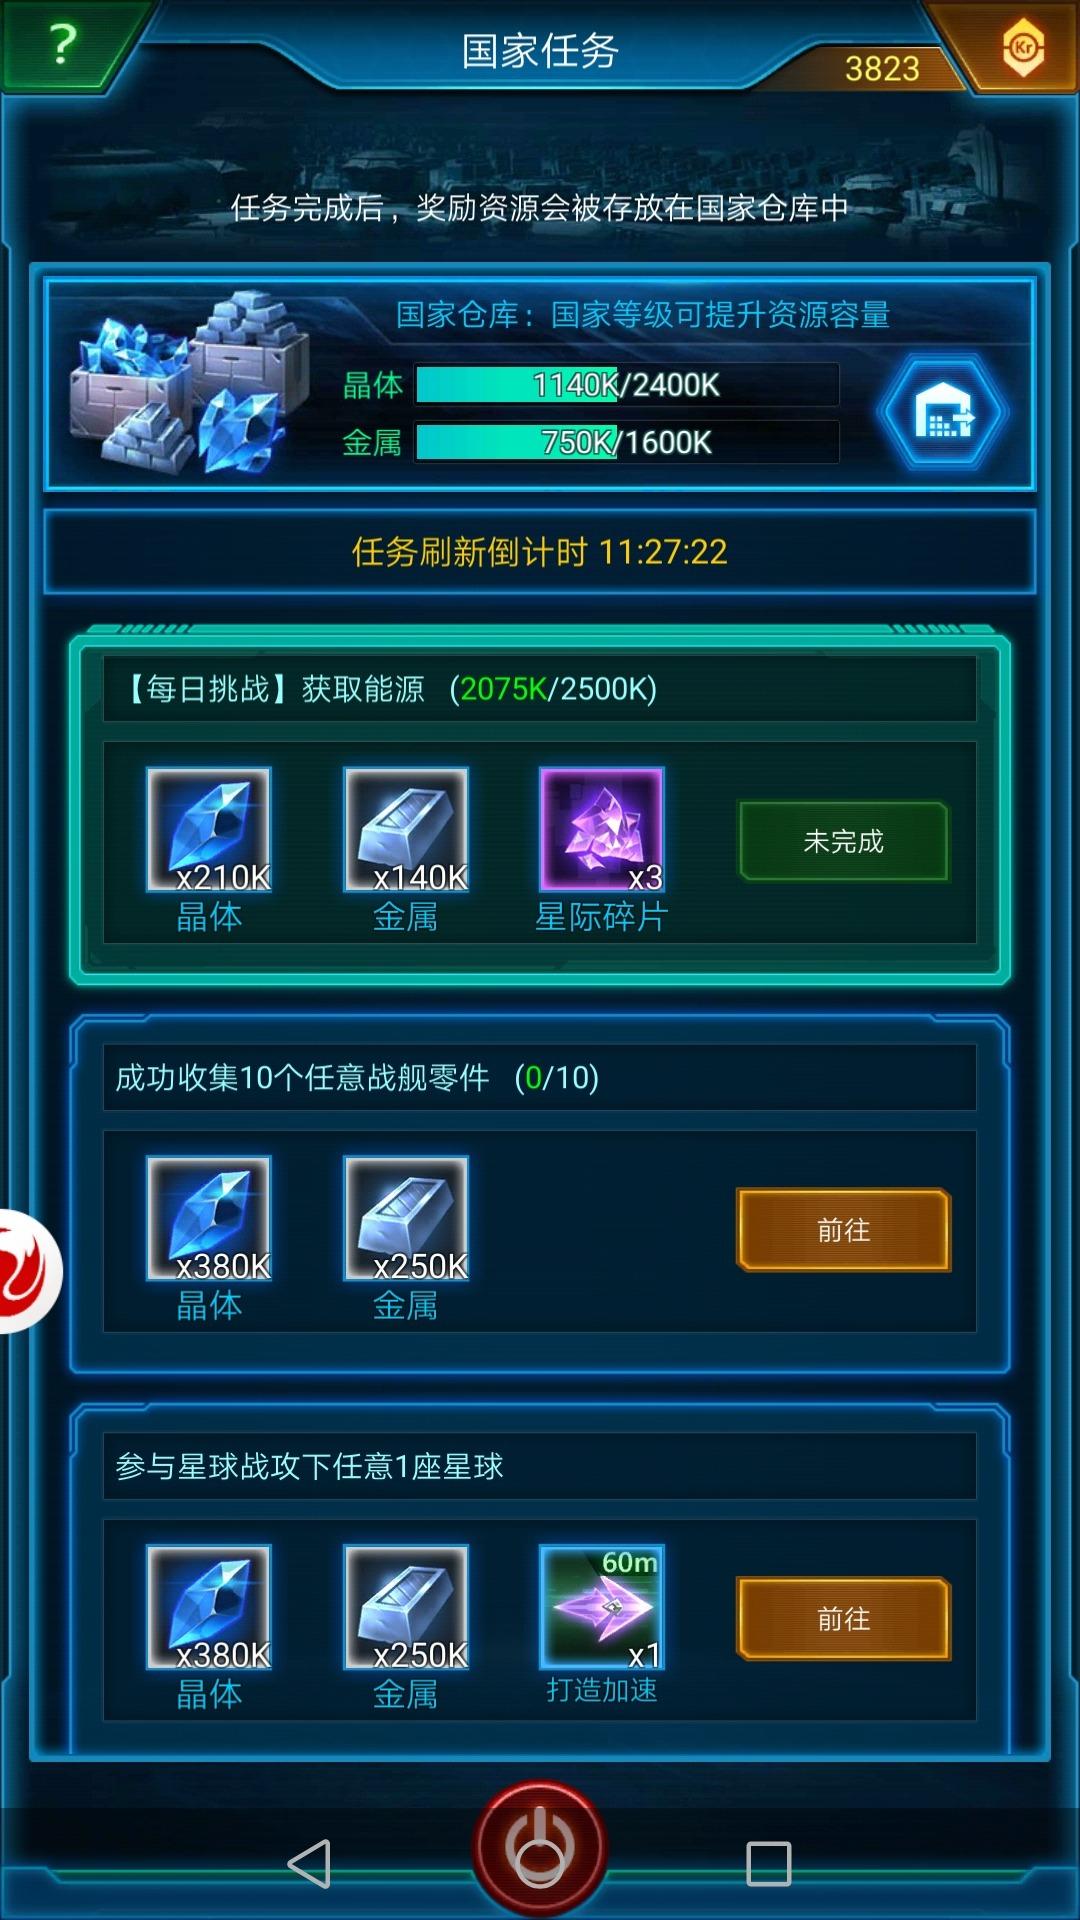 Screenshot_20190907_213236_com.jedigames.p16s.luobo.jpg